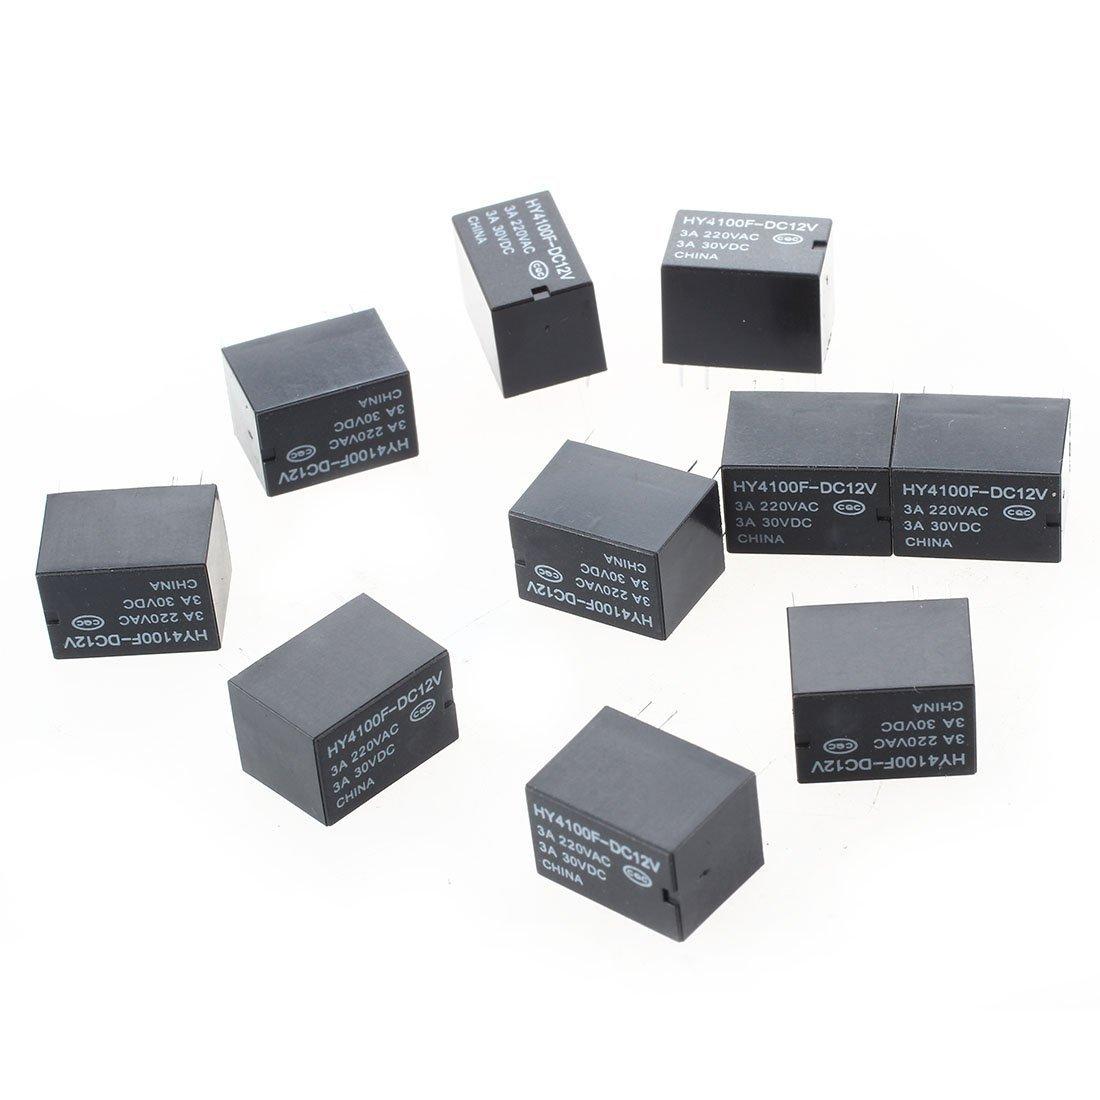 R TOOGOO 10pcs Mini electronique Relais de puissance DC12V